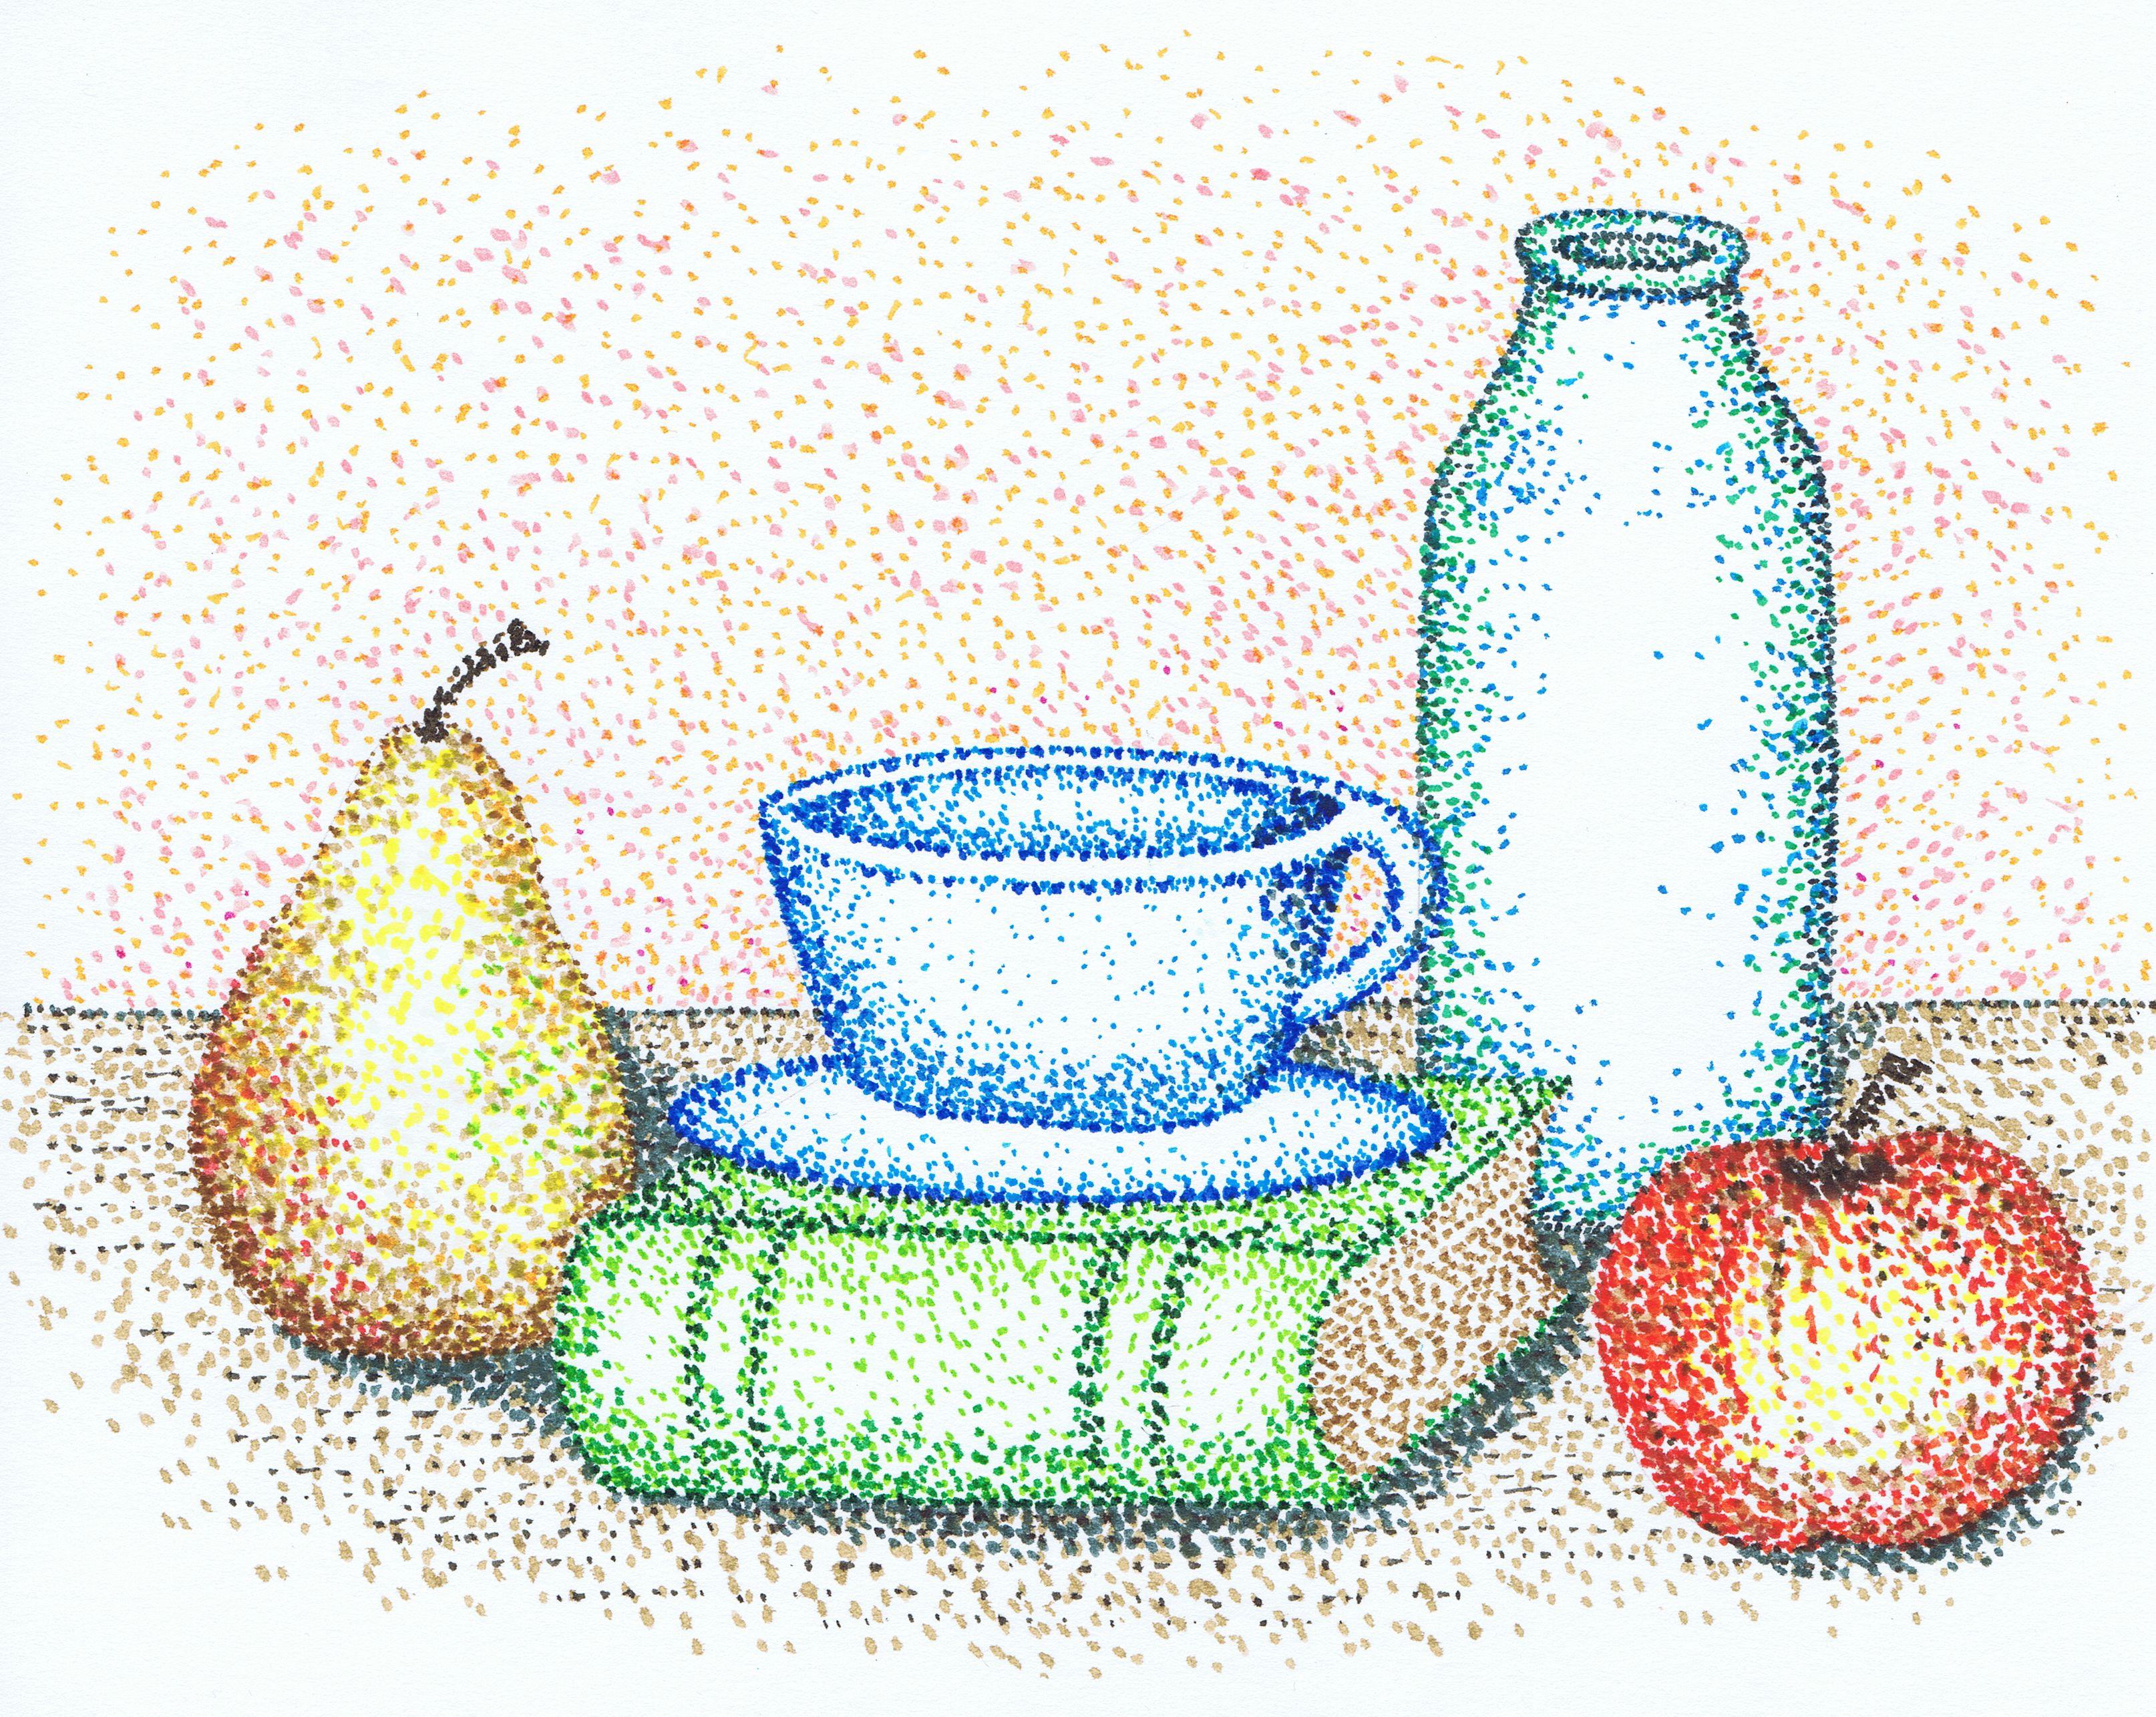 Drawn still life pointillism Sketches more of life Google